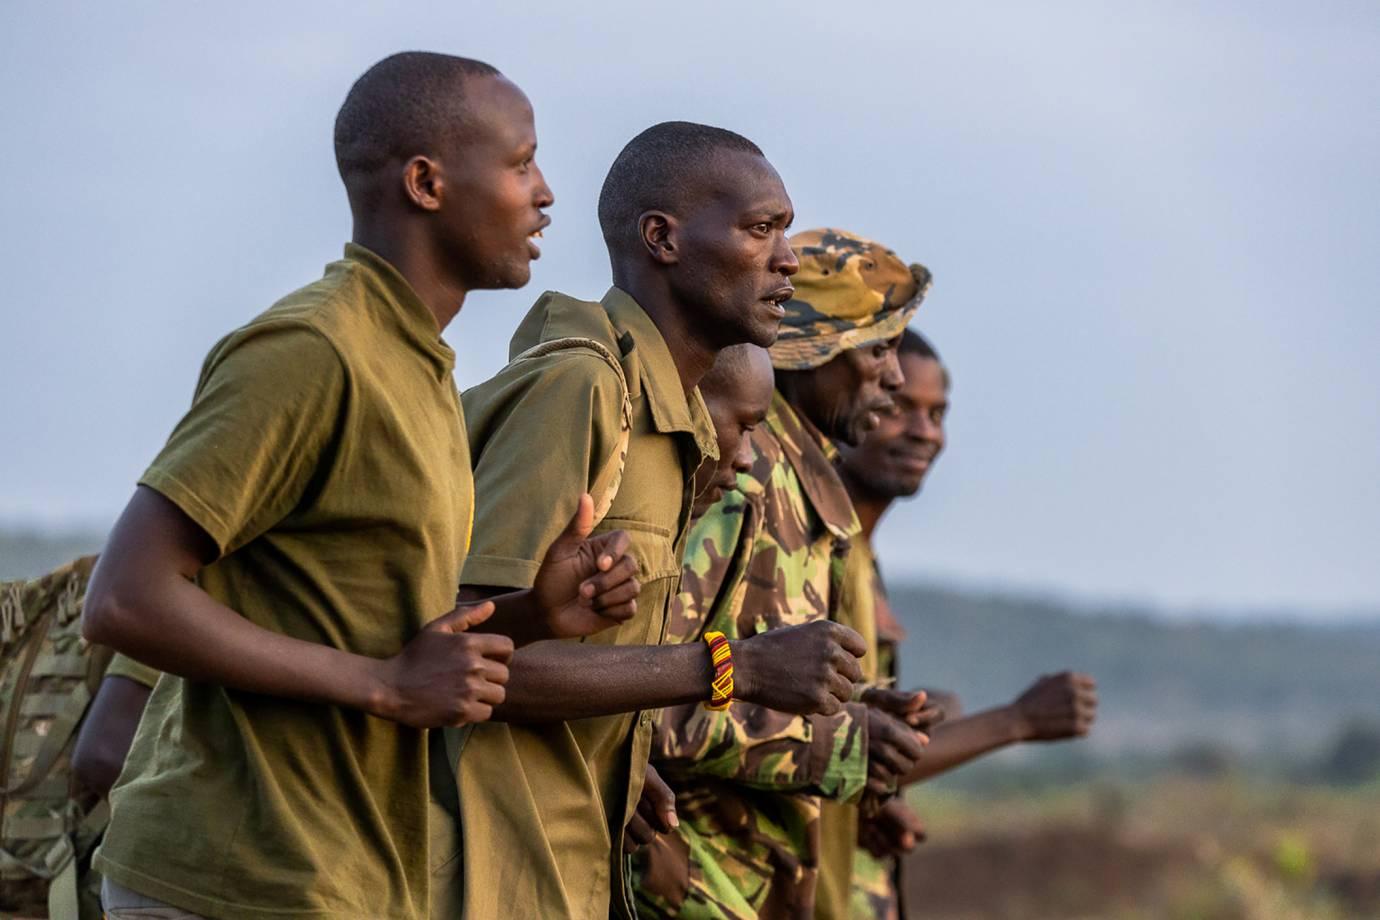 African Wildlife rangers run in Wildlife Ranger Run anti-poaching challenge